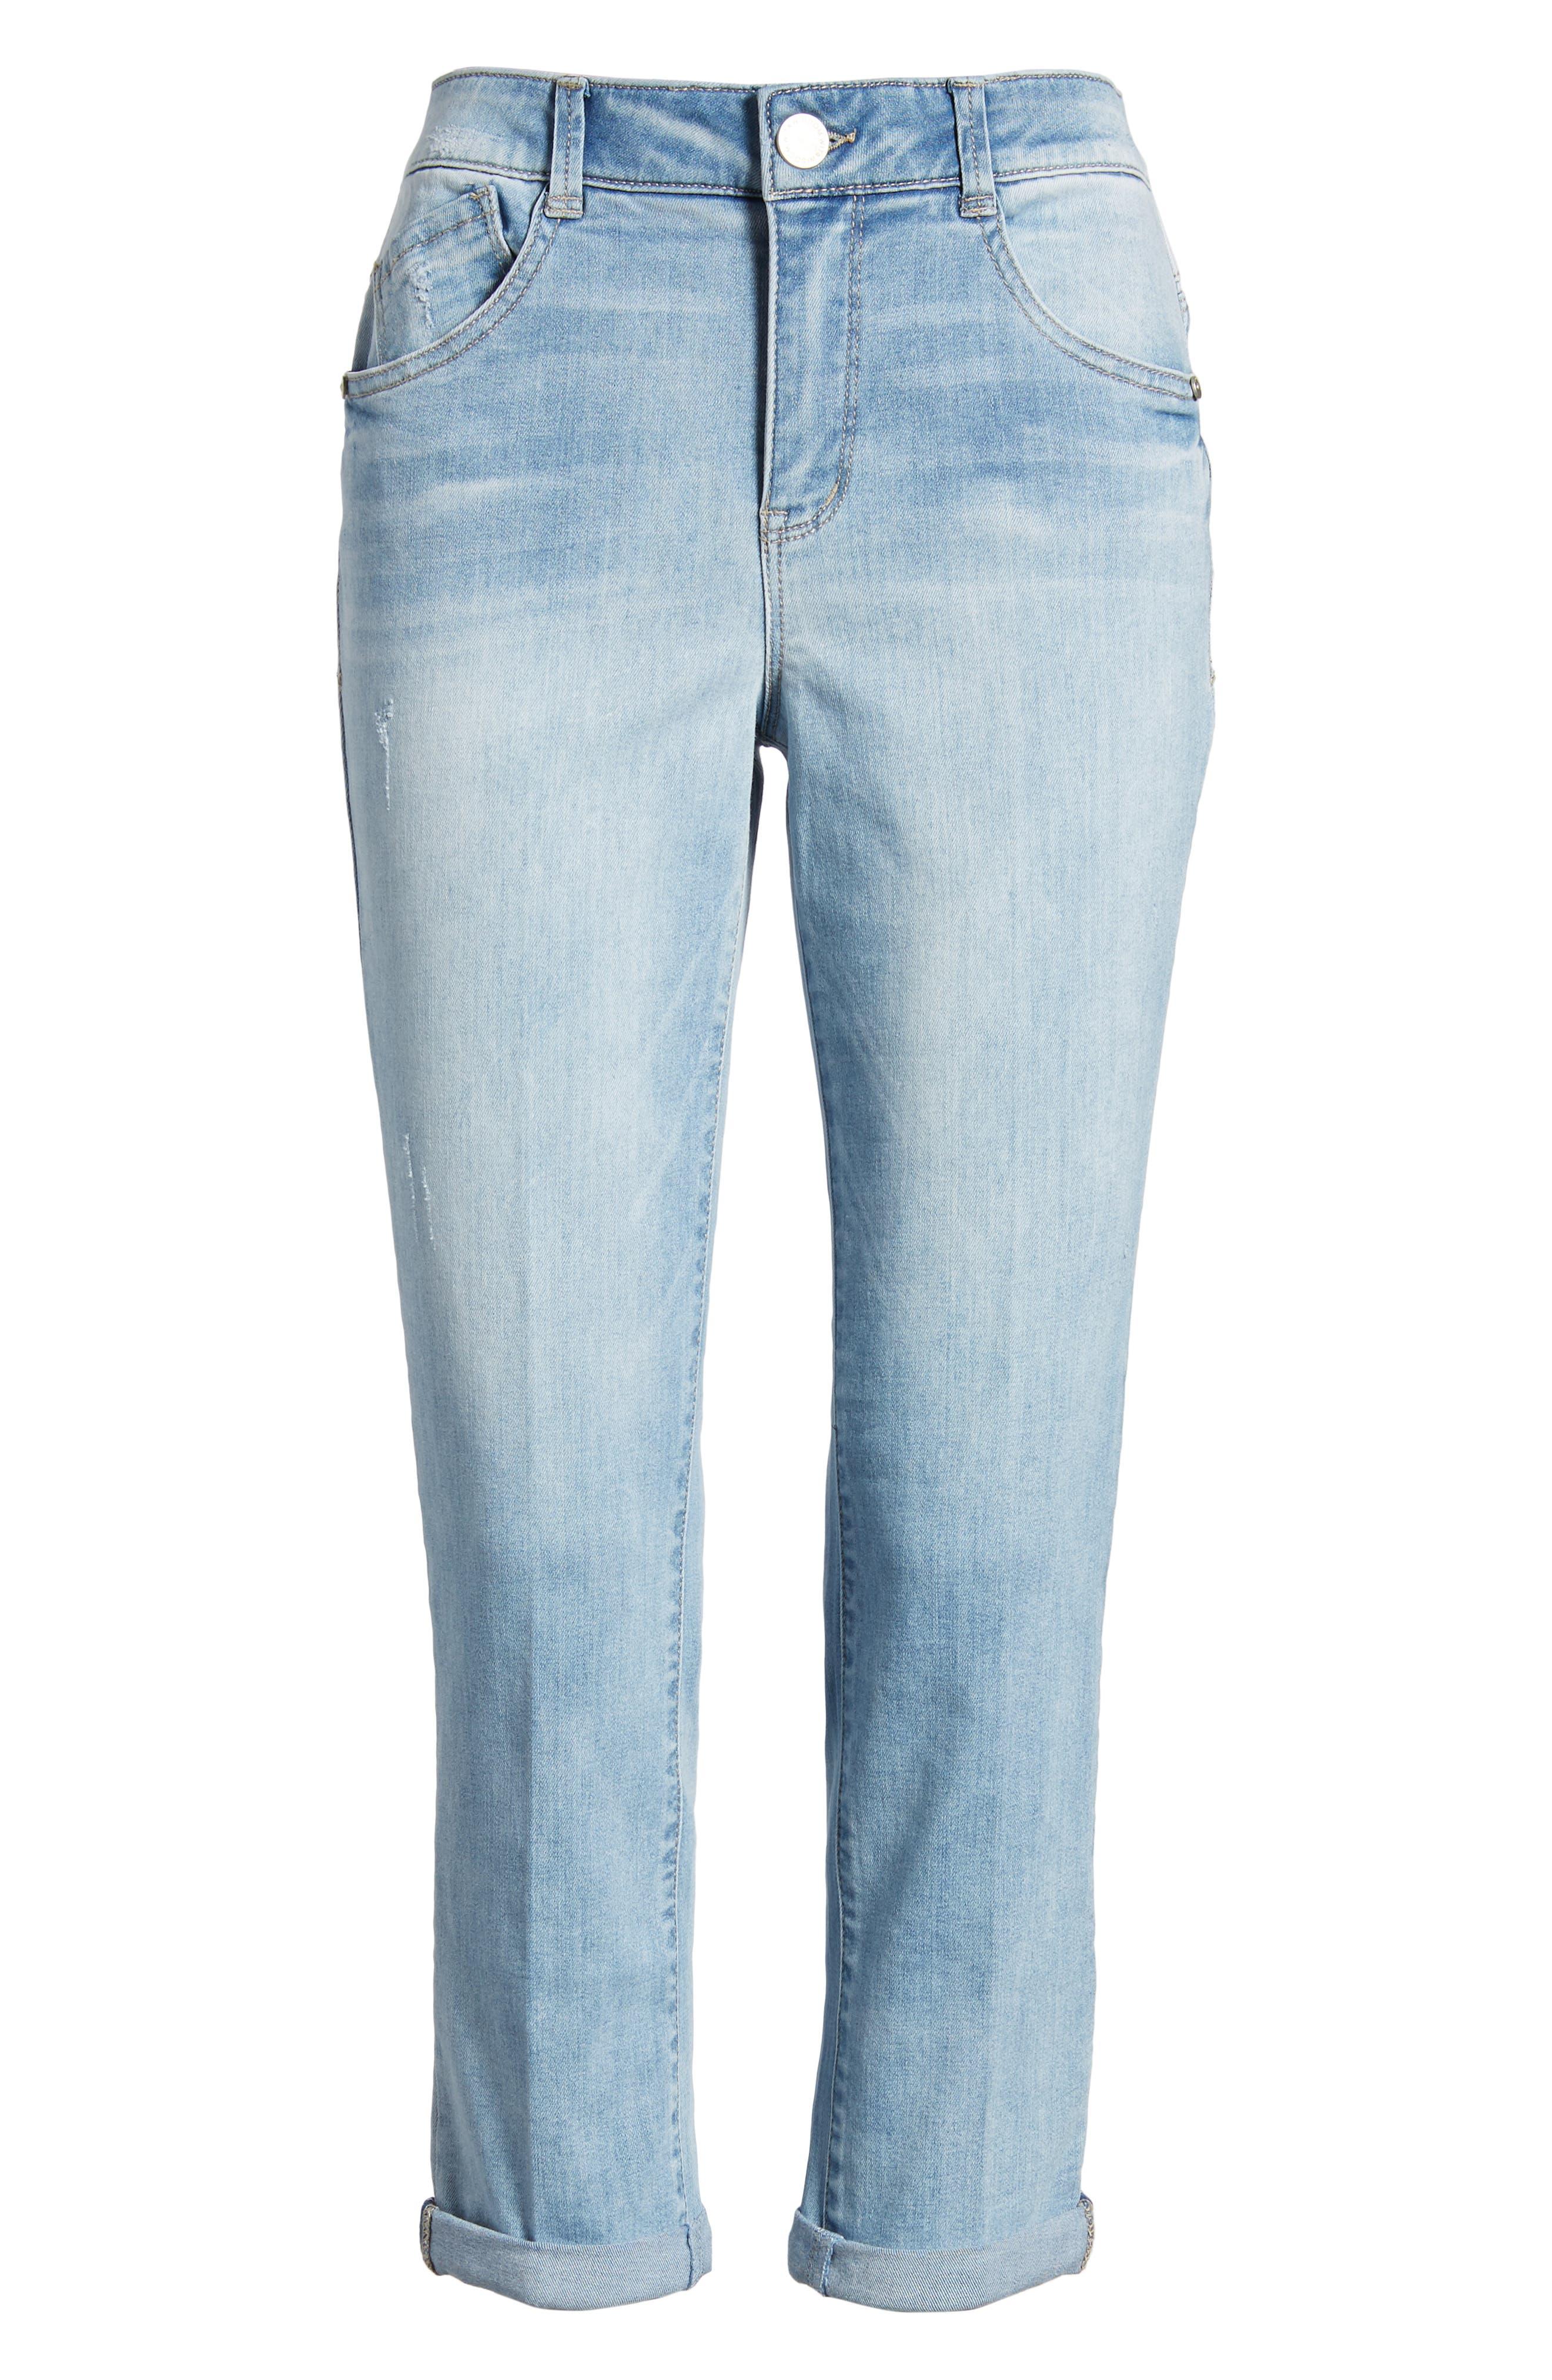 Ab-solution High Rise Crop Jeans,                             Alternate thumbnail 7, color,                             Light Blue